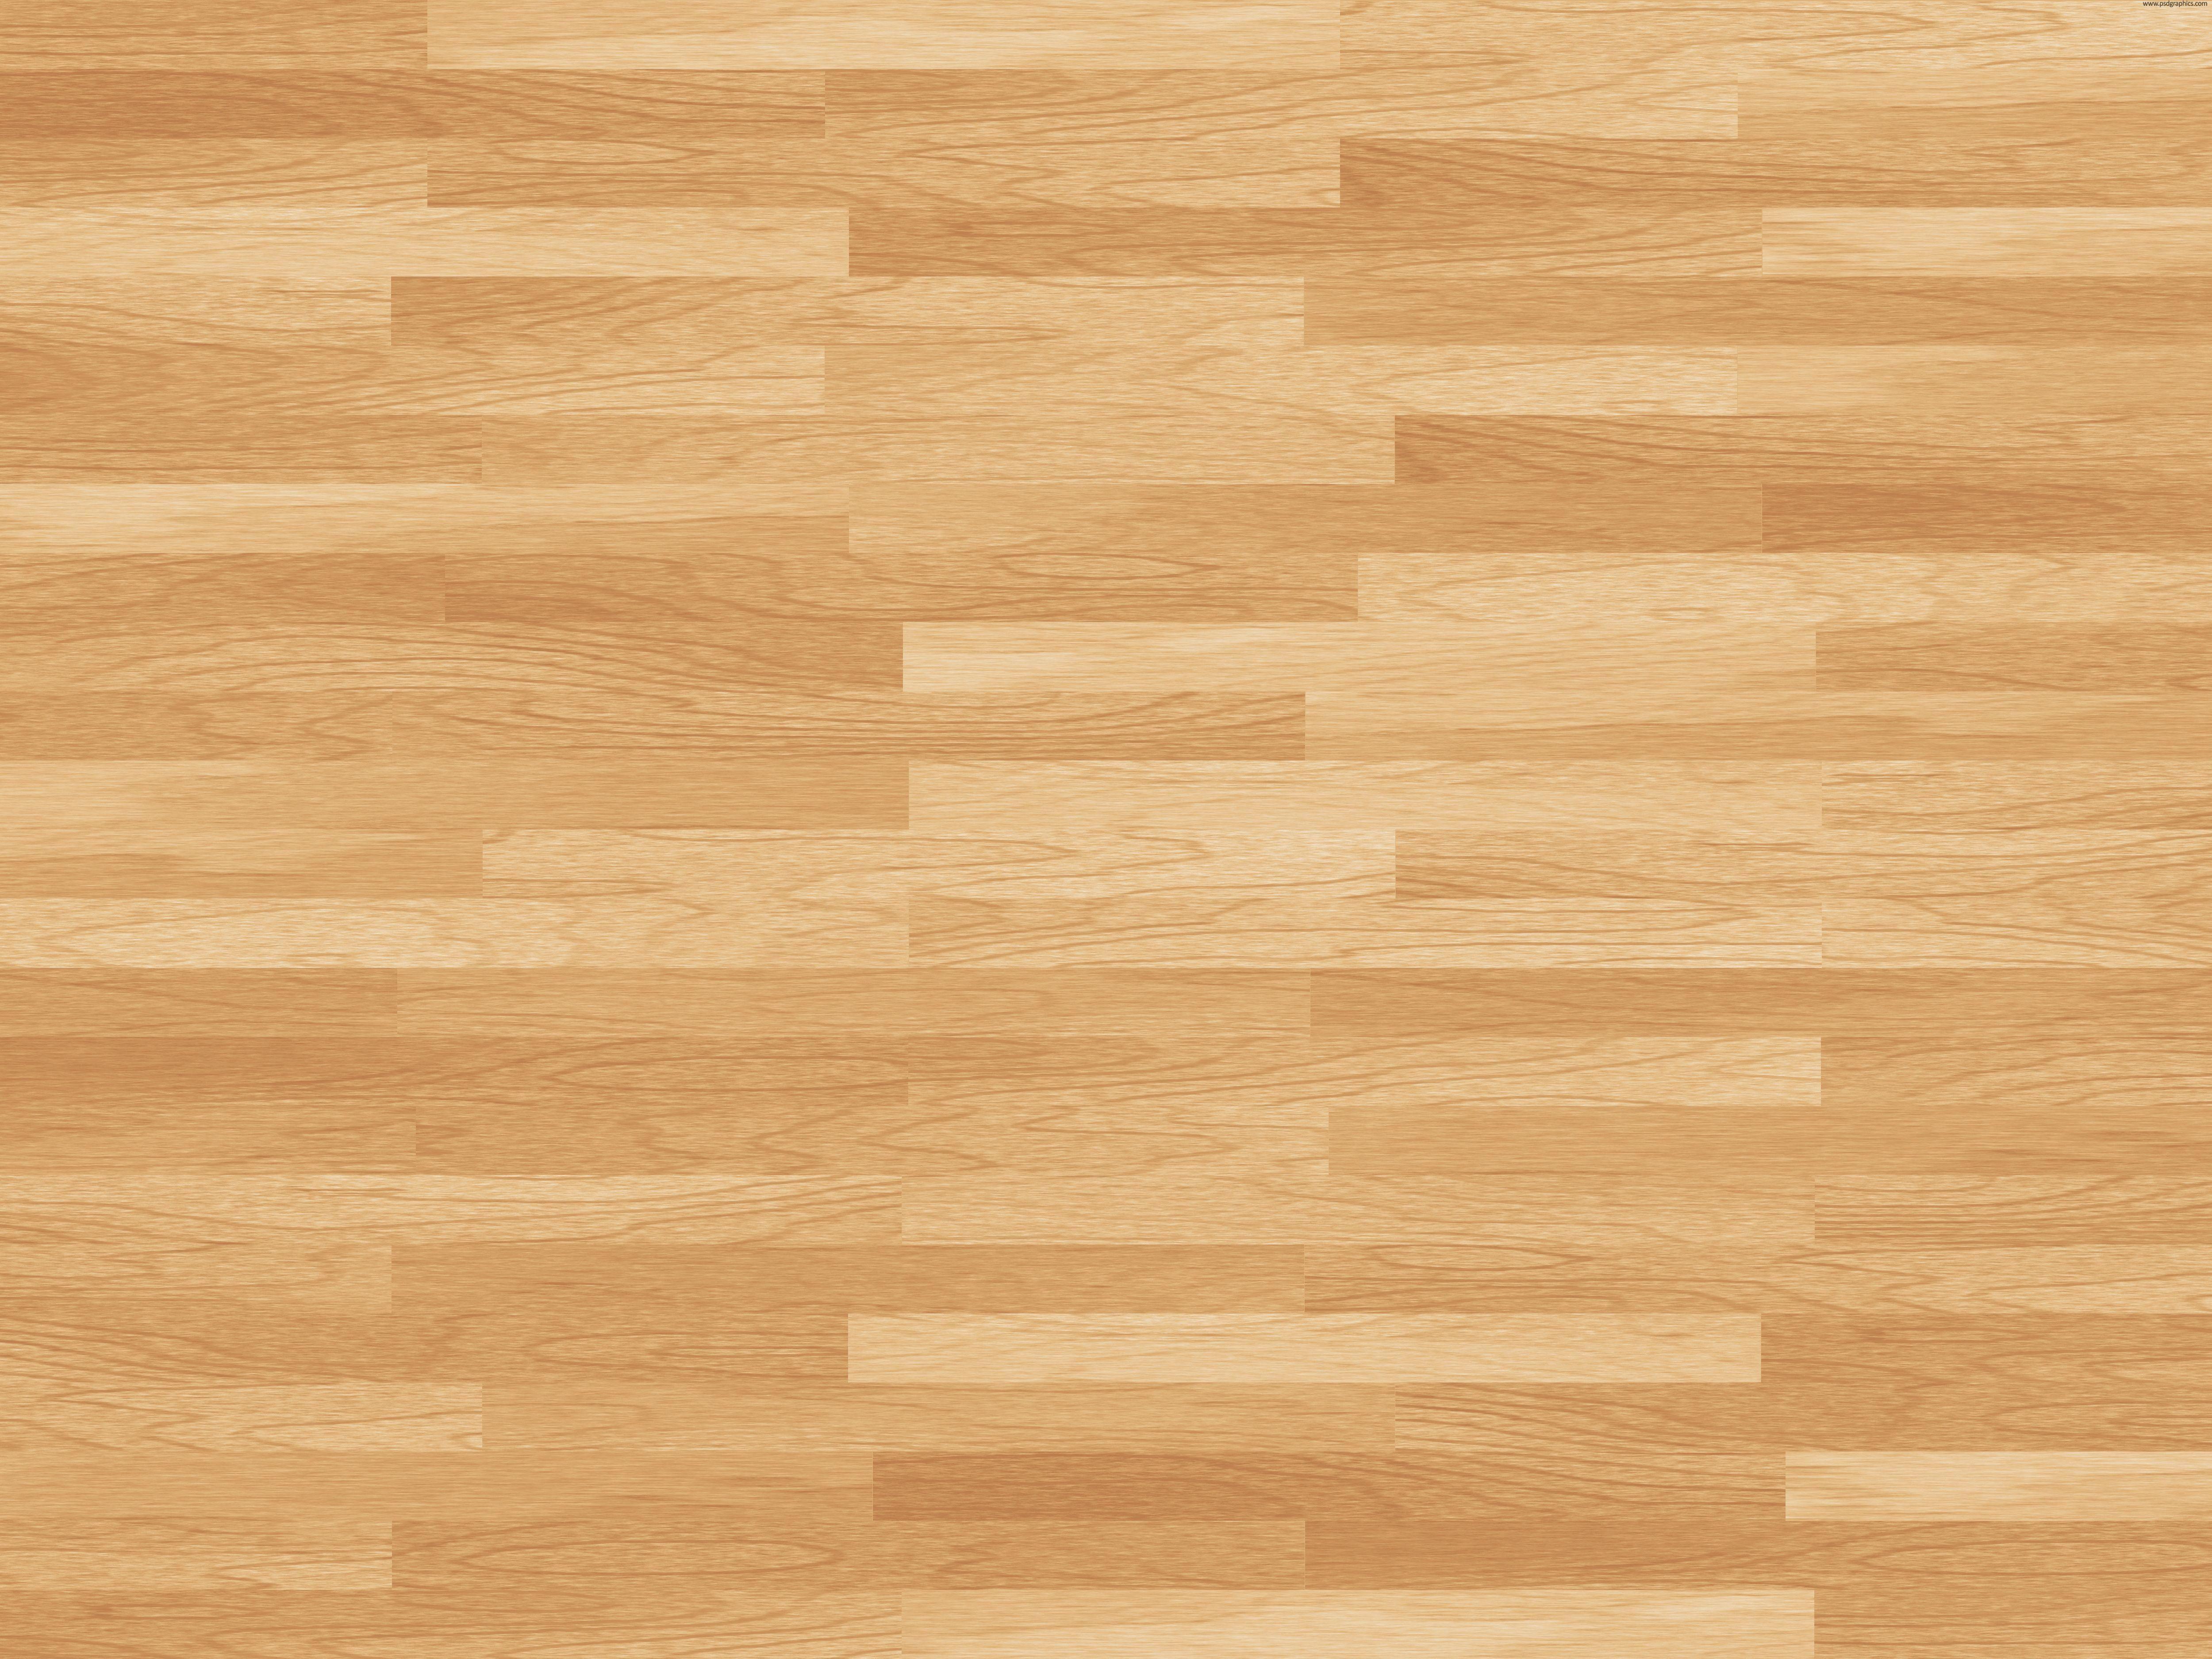 Light Wood Floor Texture Google Search Woodflooringfarmhouse Chao De Madeira De Madeira Papel Decorativo